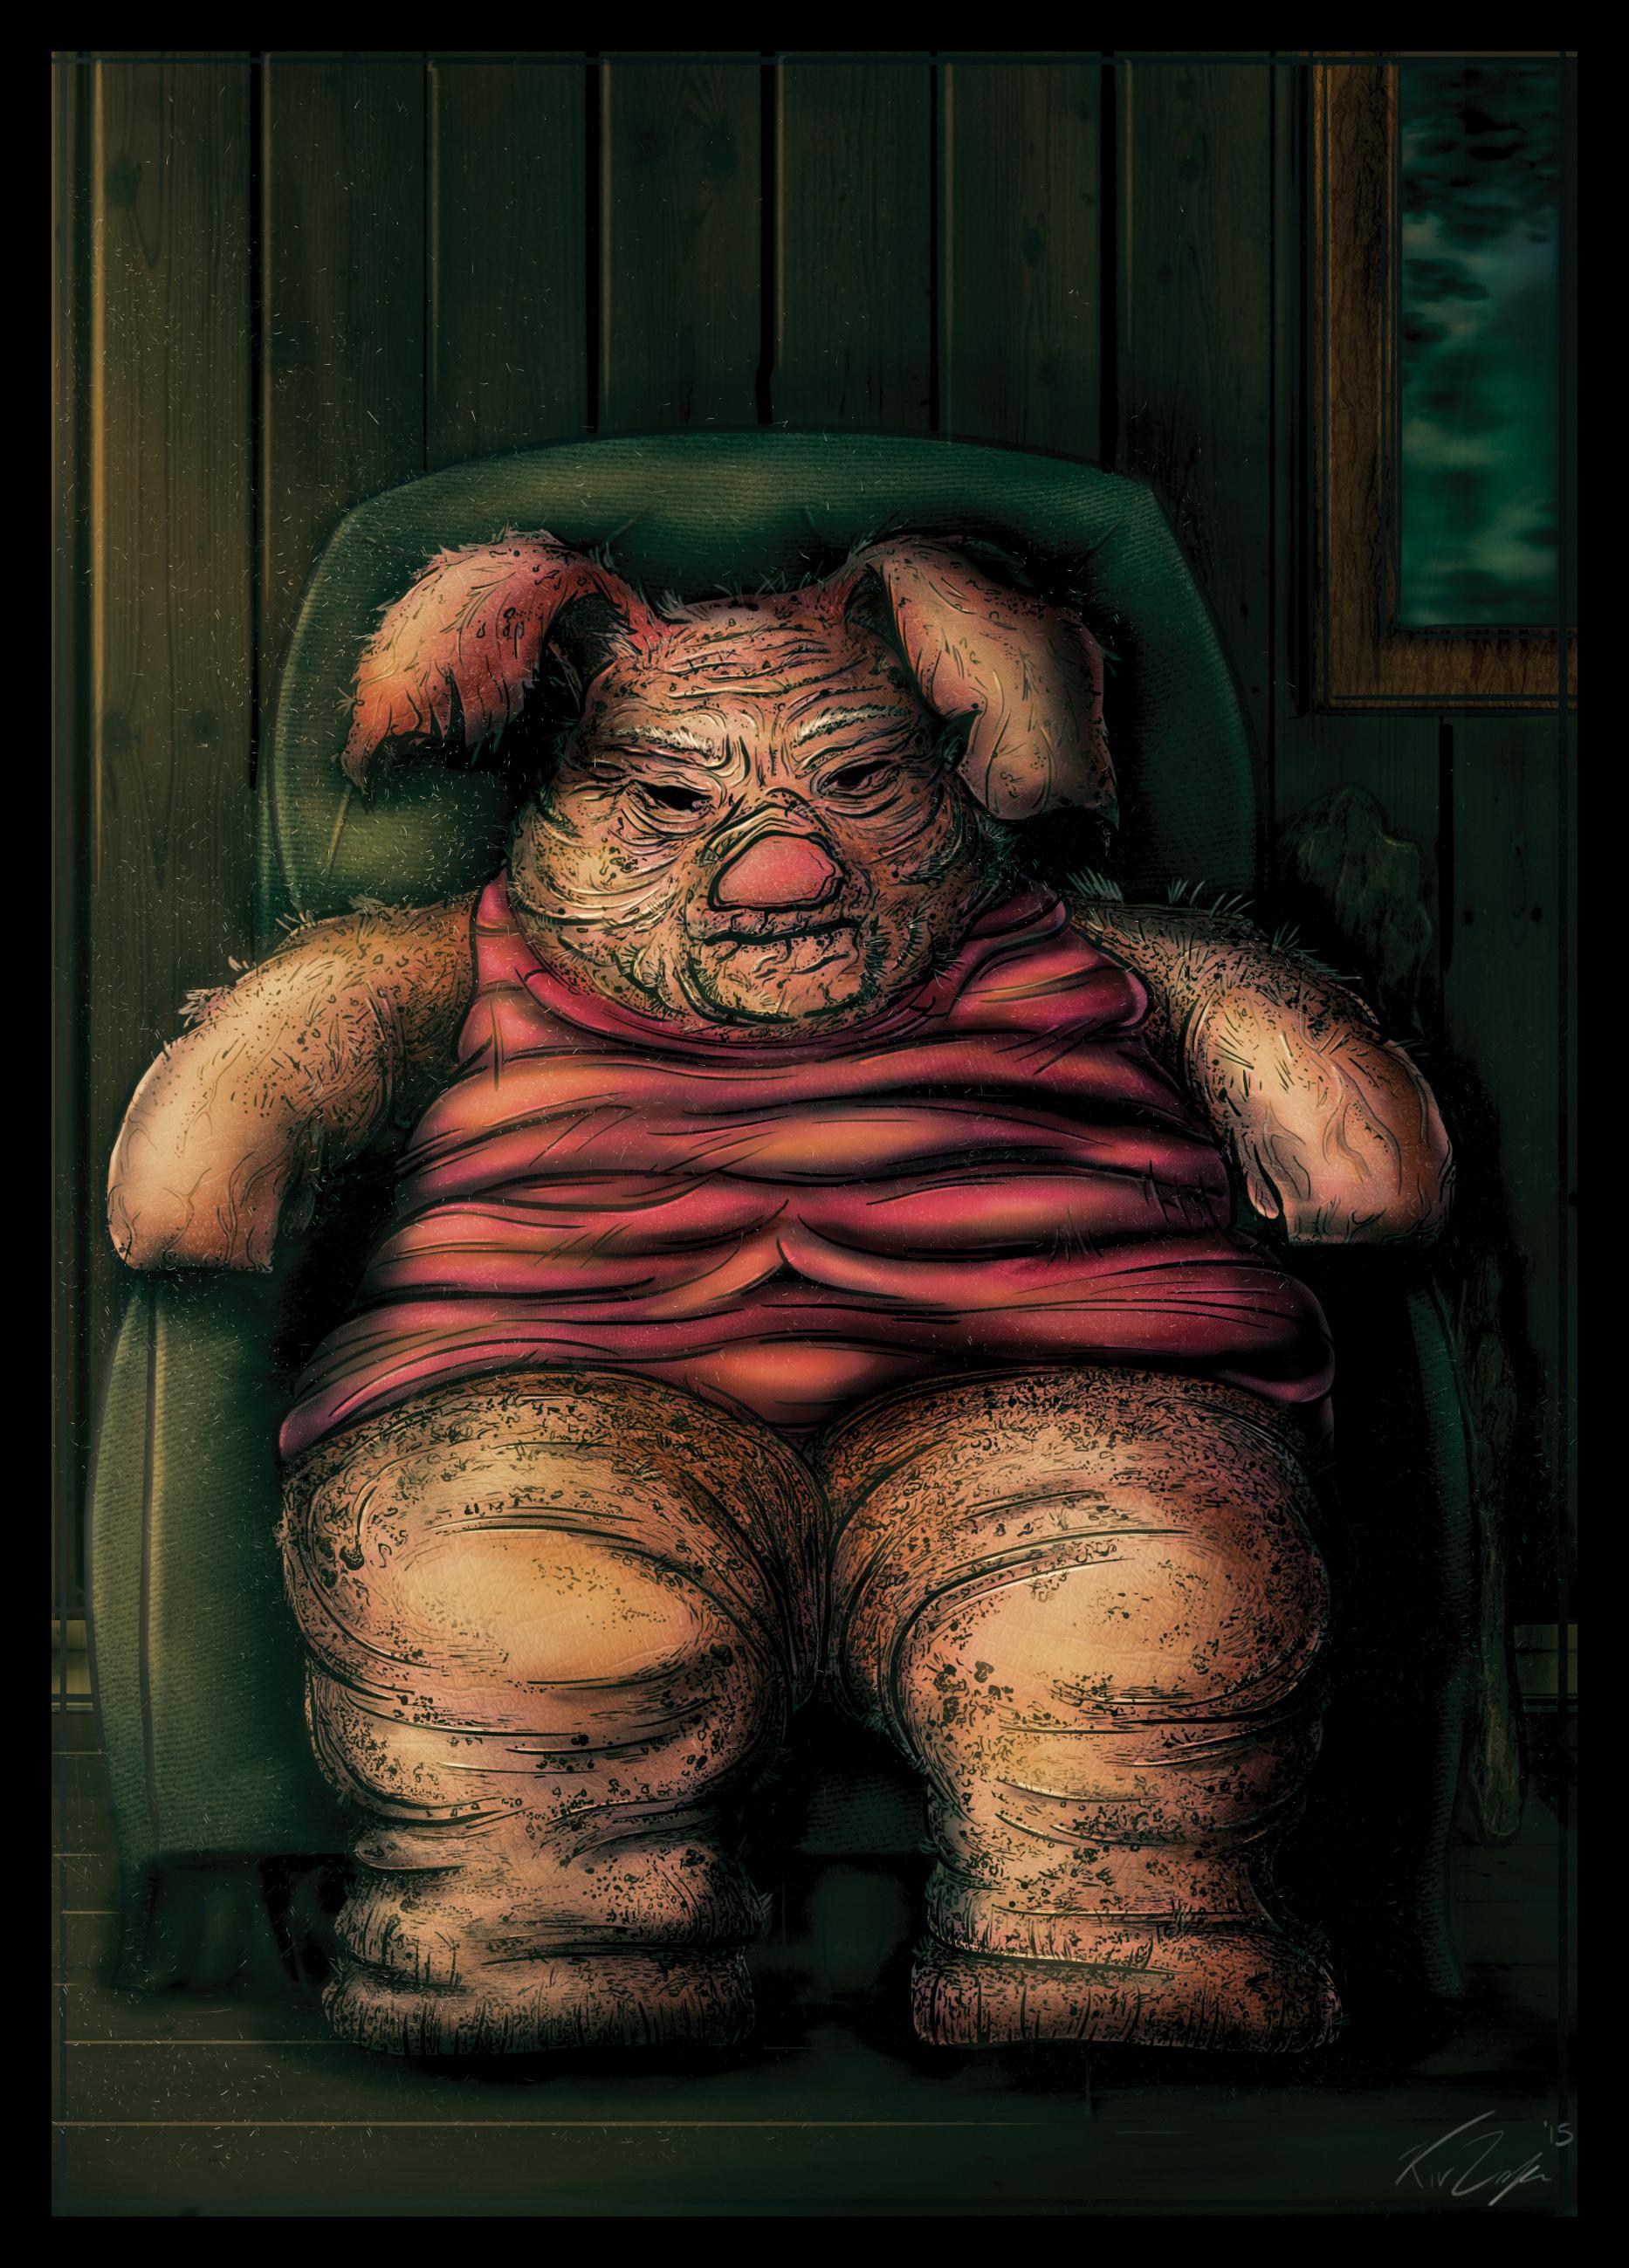 Piglet was tiny, Piglet was cute...